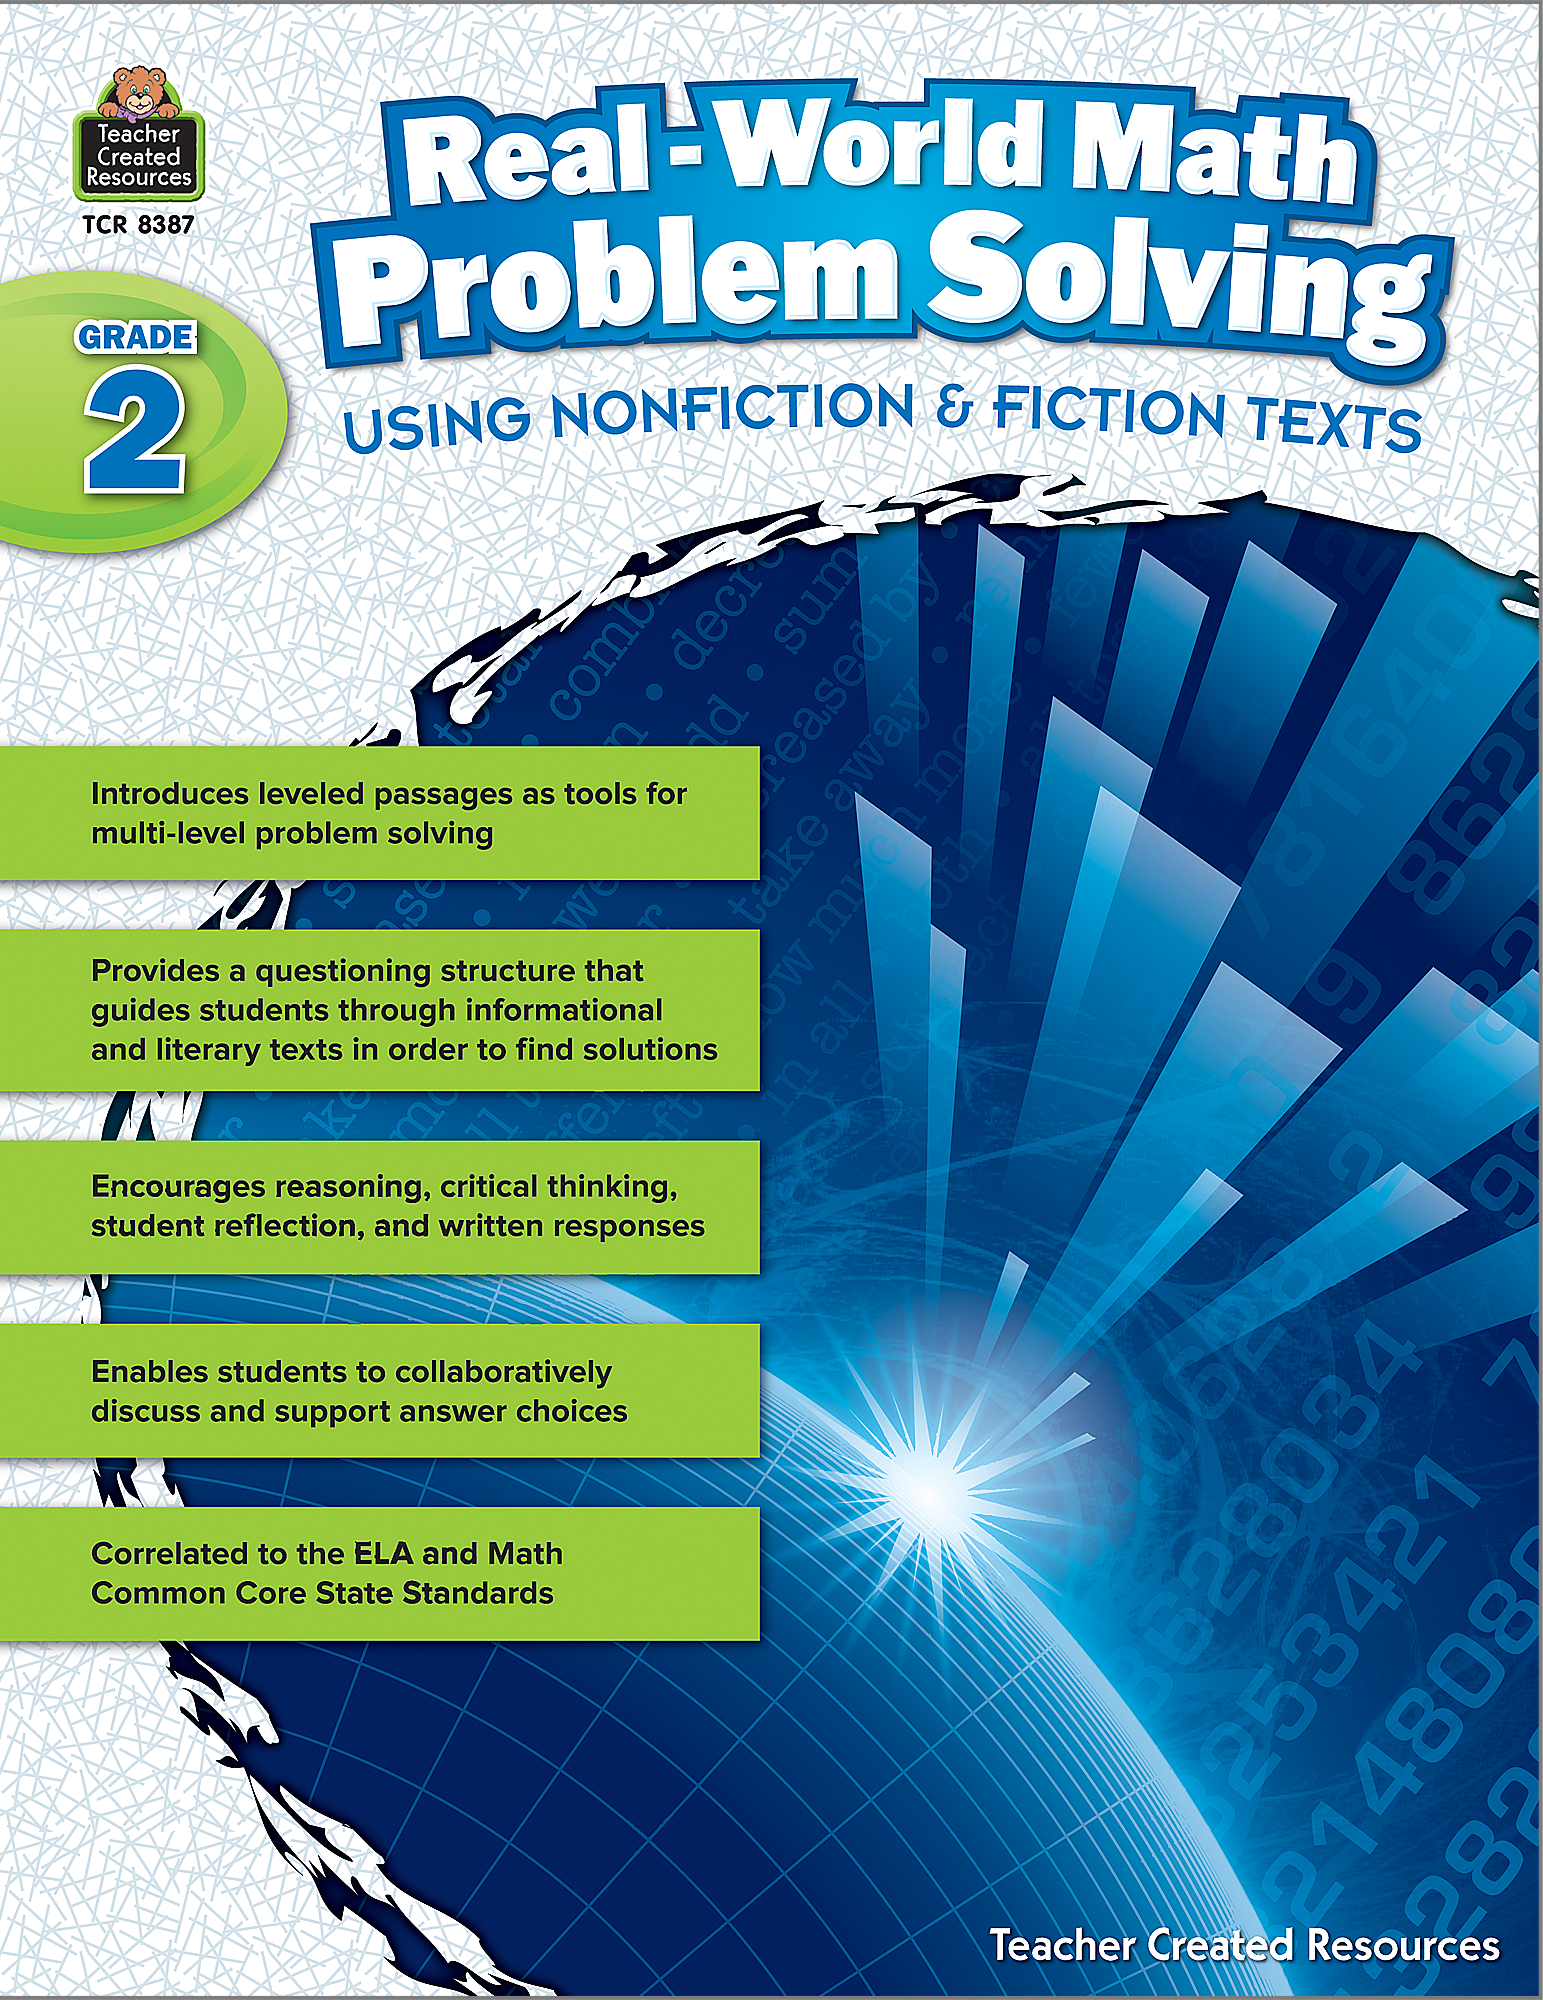 Real-World Math Problem Solving Grade 2 | Math problem solving ...